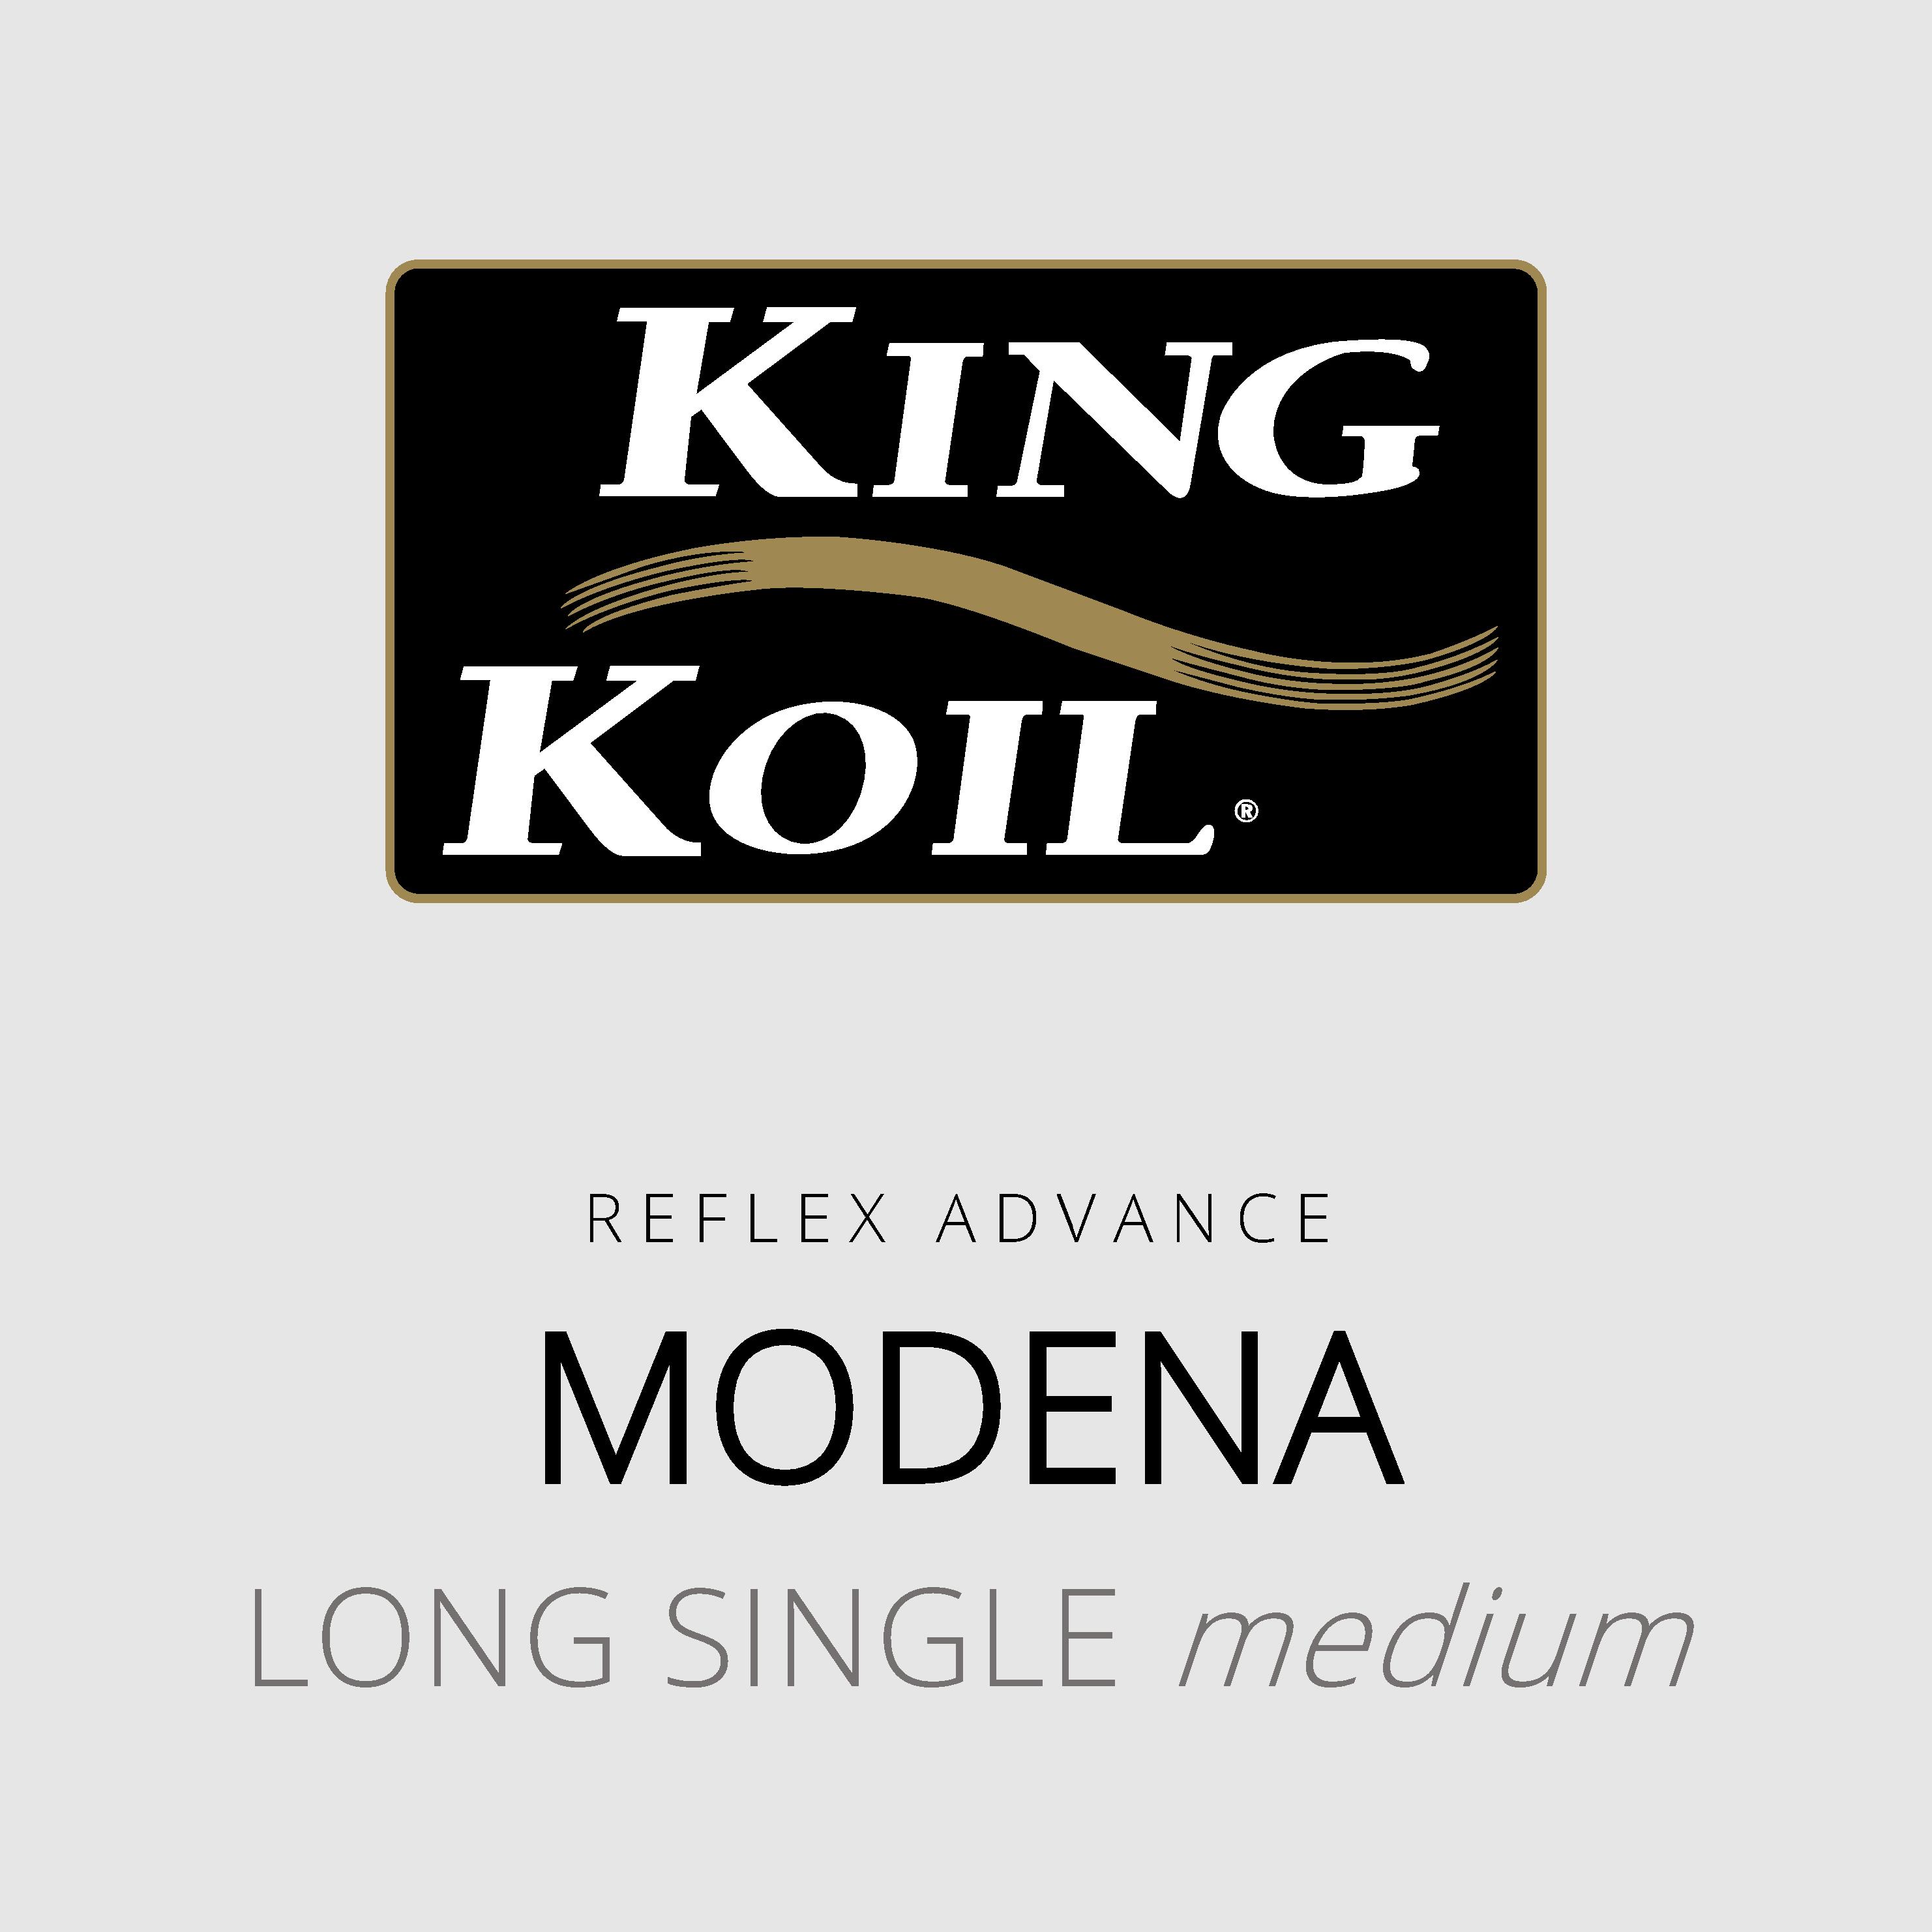 King Koil – Modena – Reflex Advance – Long Single Medium Mattress